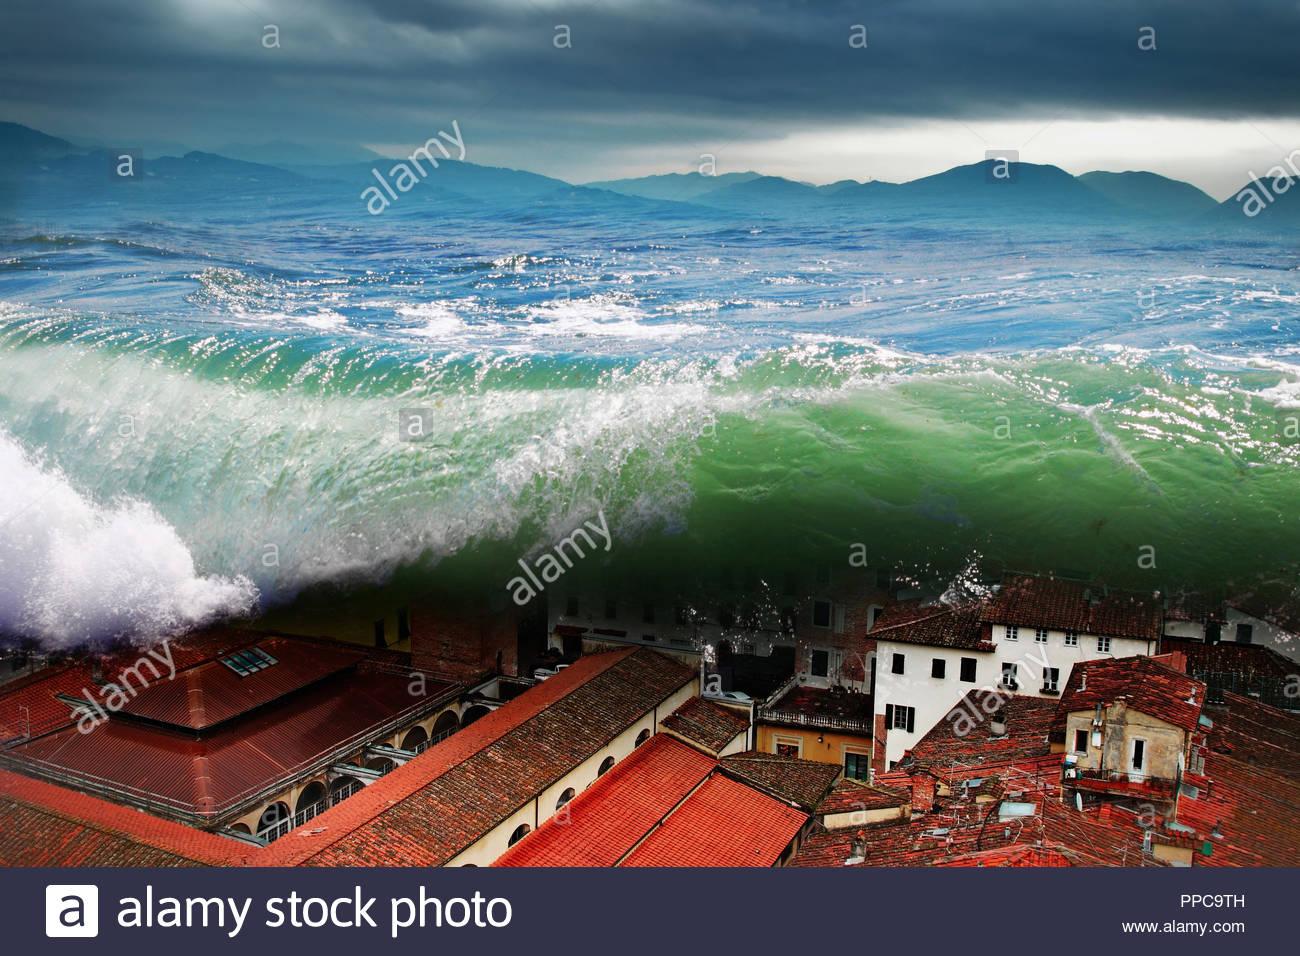 Great wave crashing above the city. Global flood. - Stock Image